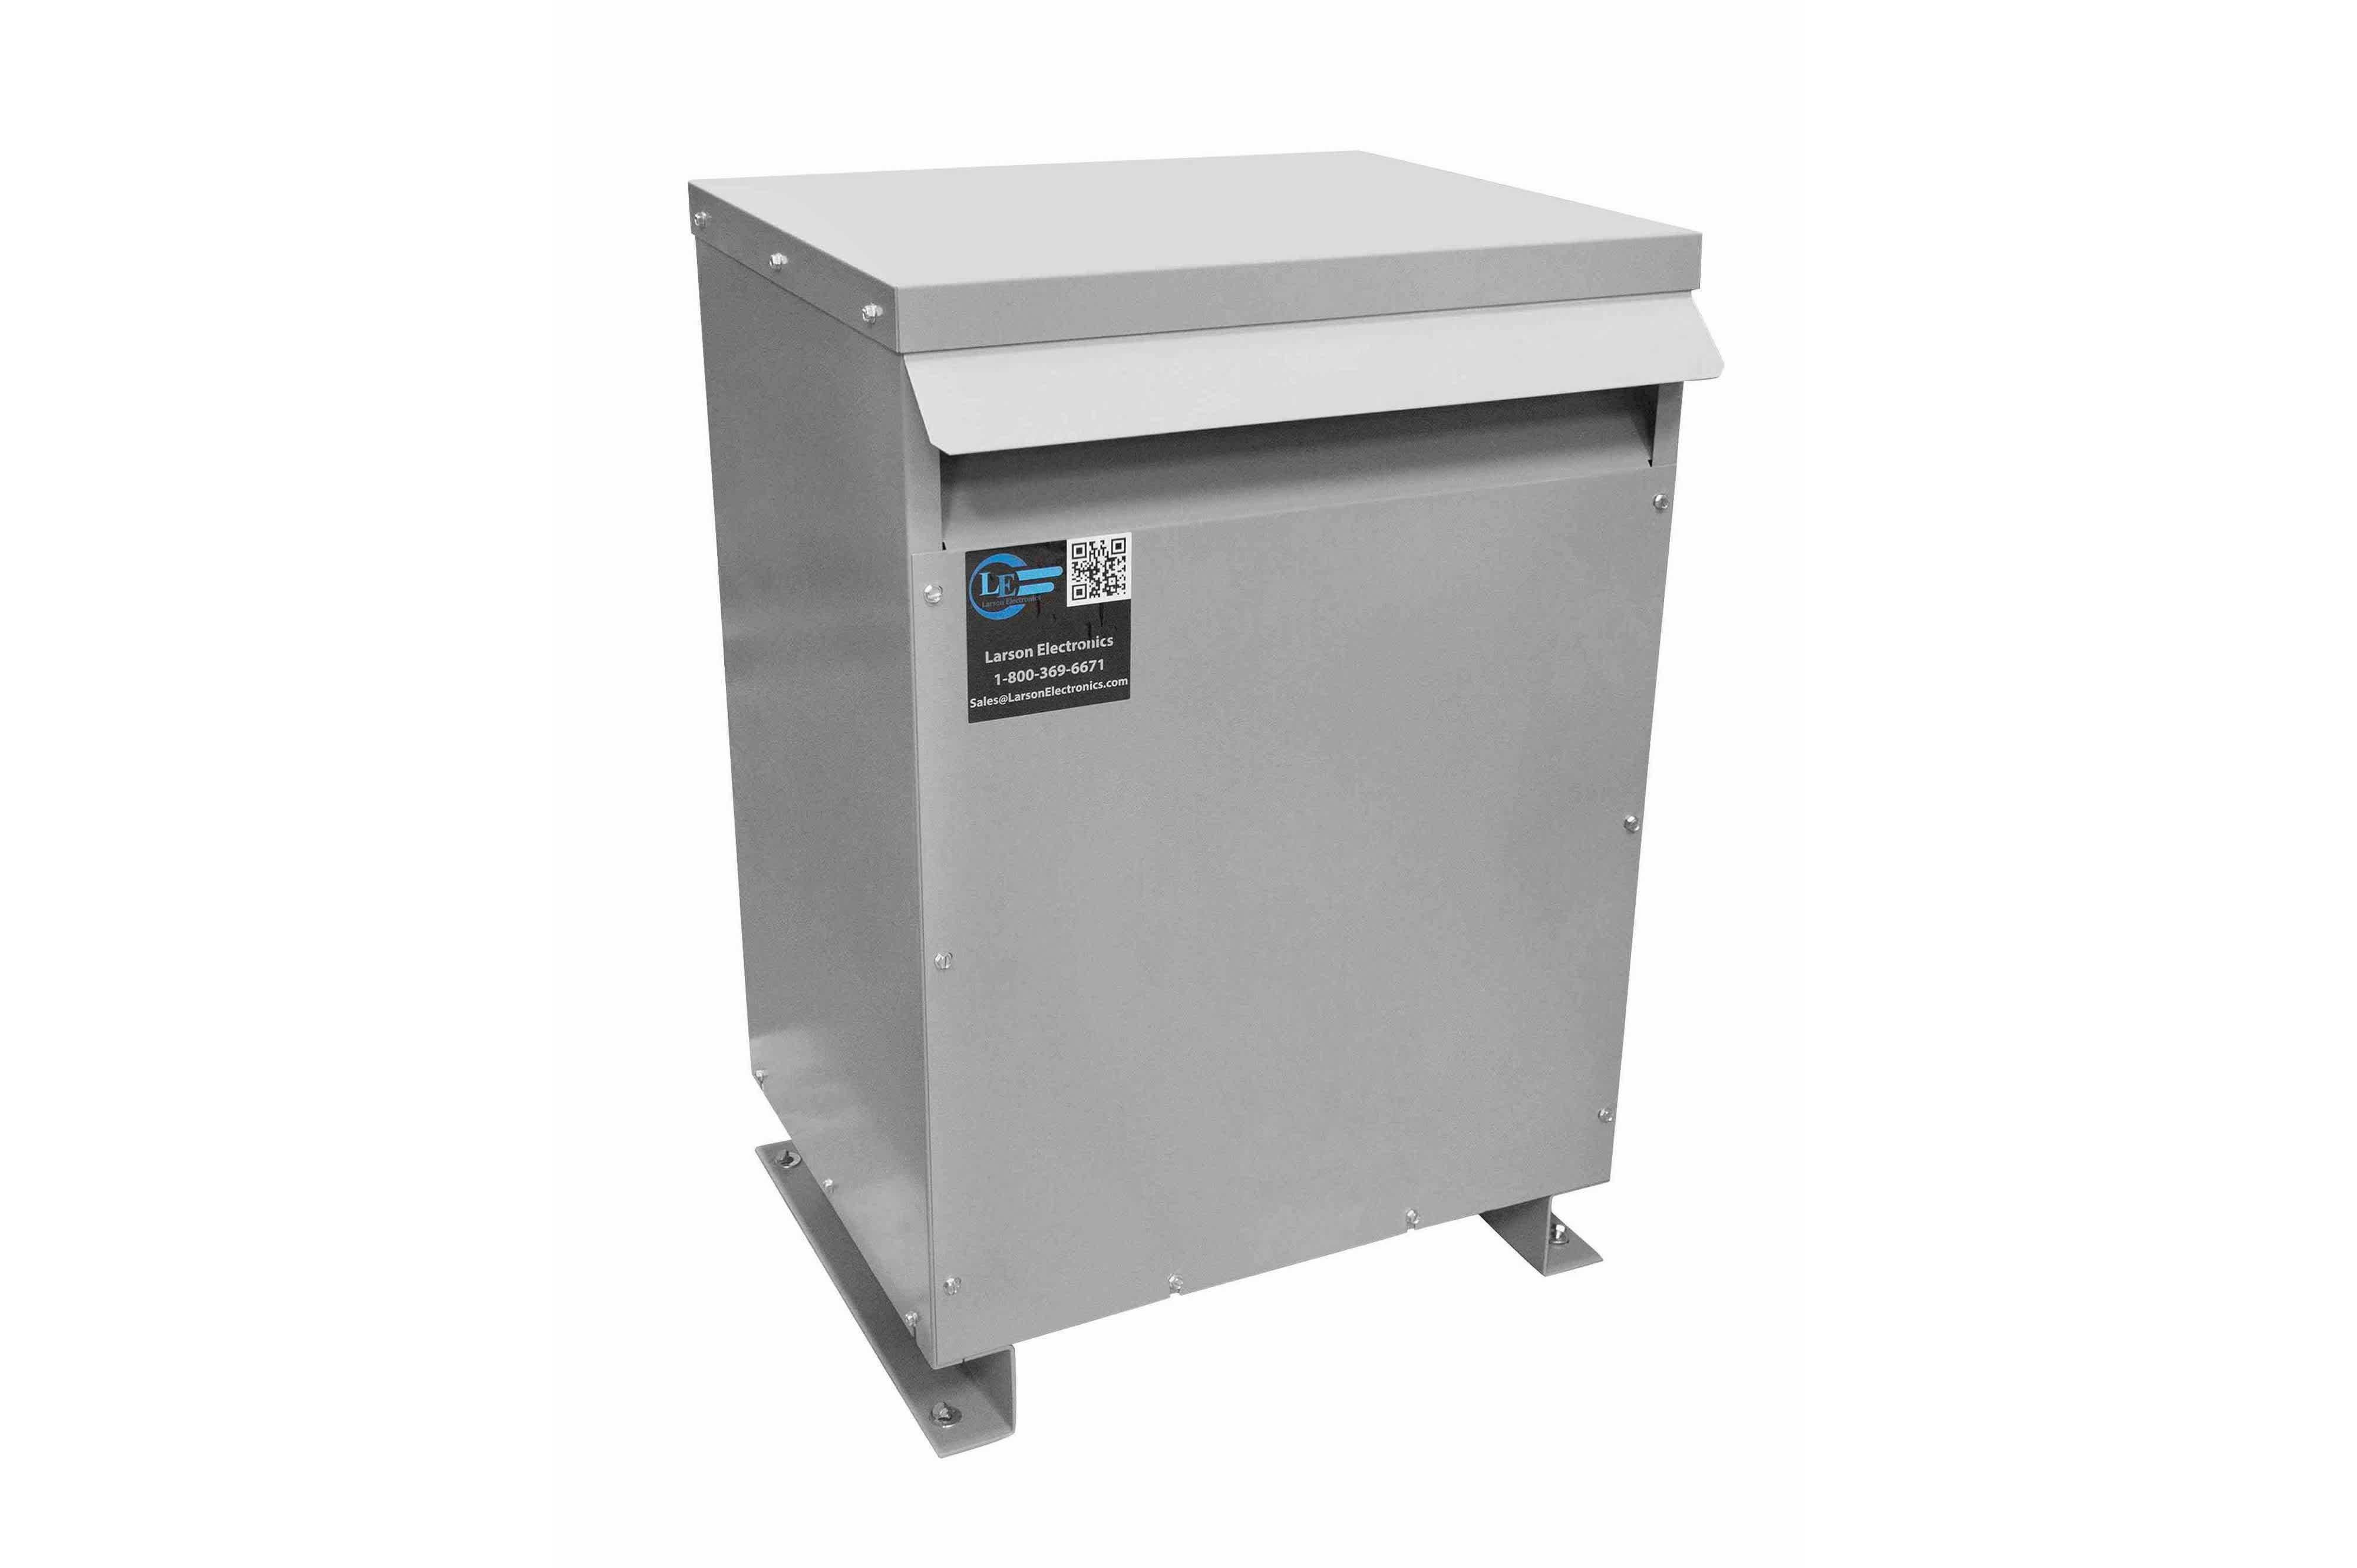 275 kVA 3PH Isolation Transformer, 480V Wye Primary, 380V Delta Secondary, N3R, Ventilated, 60 Hz